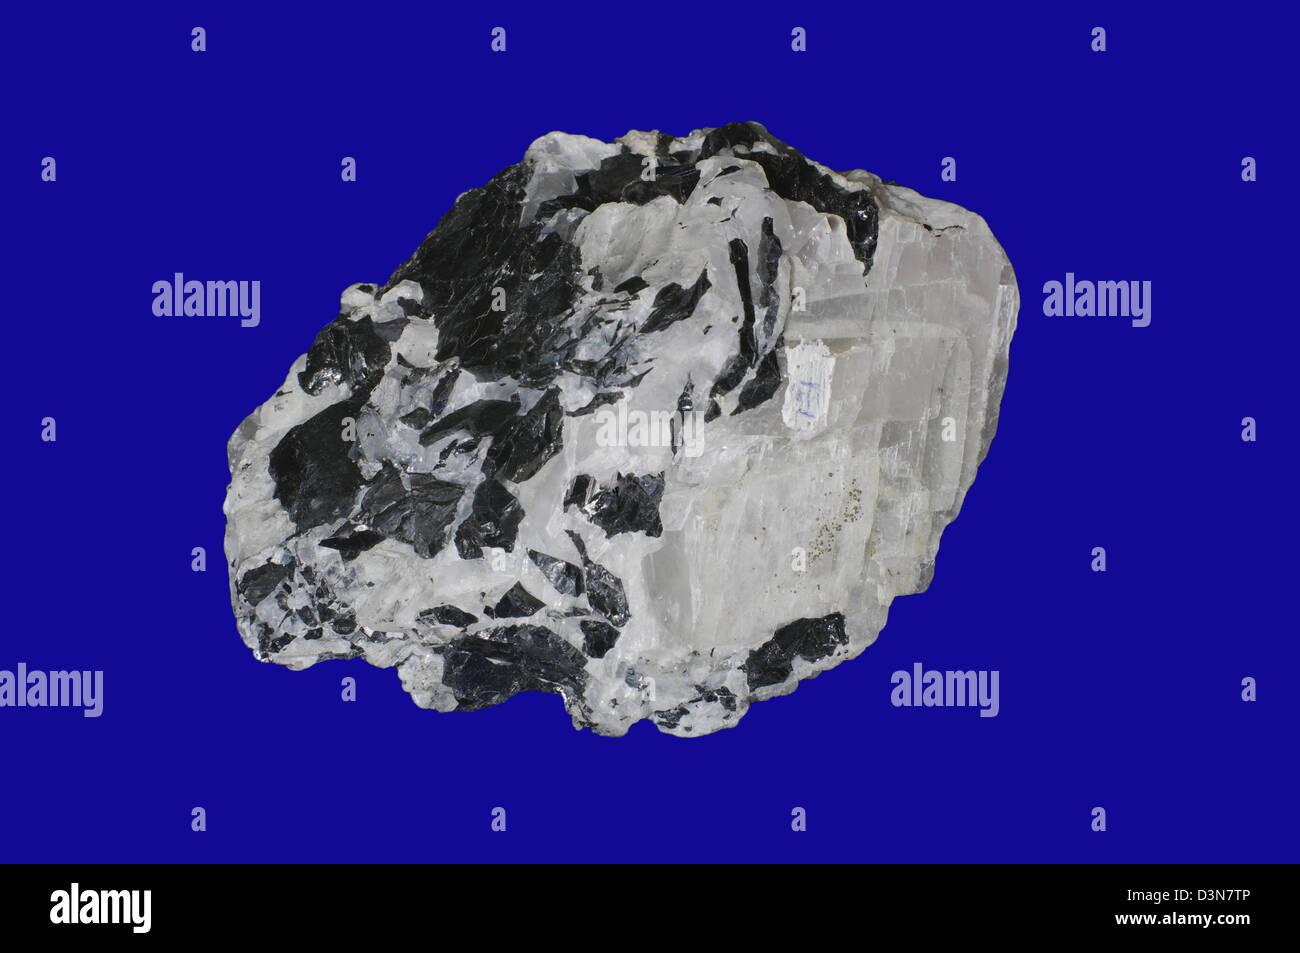 sphalerite, calcite on blue - Stock Image